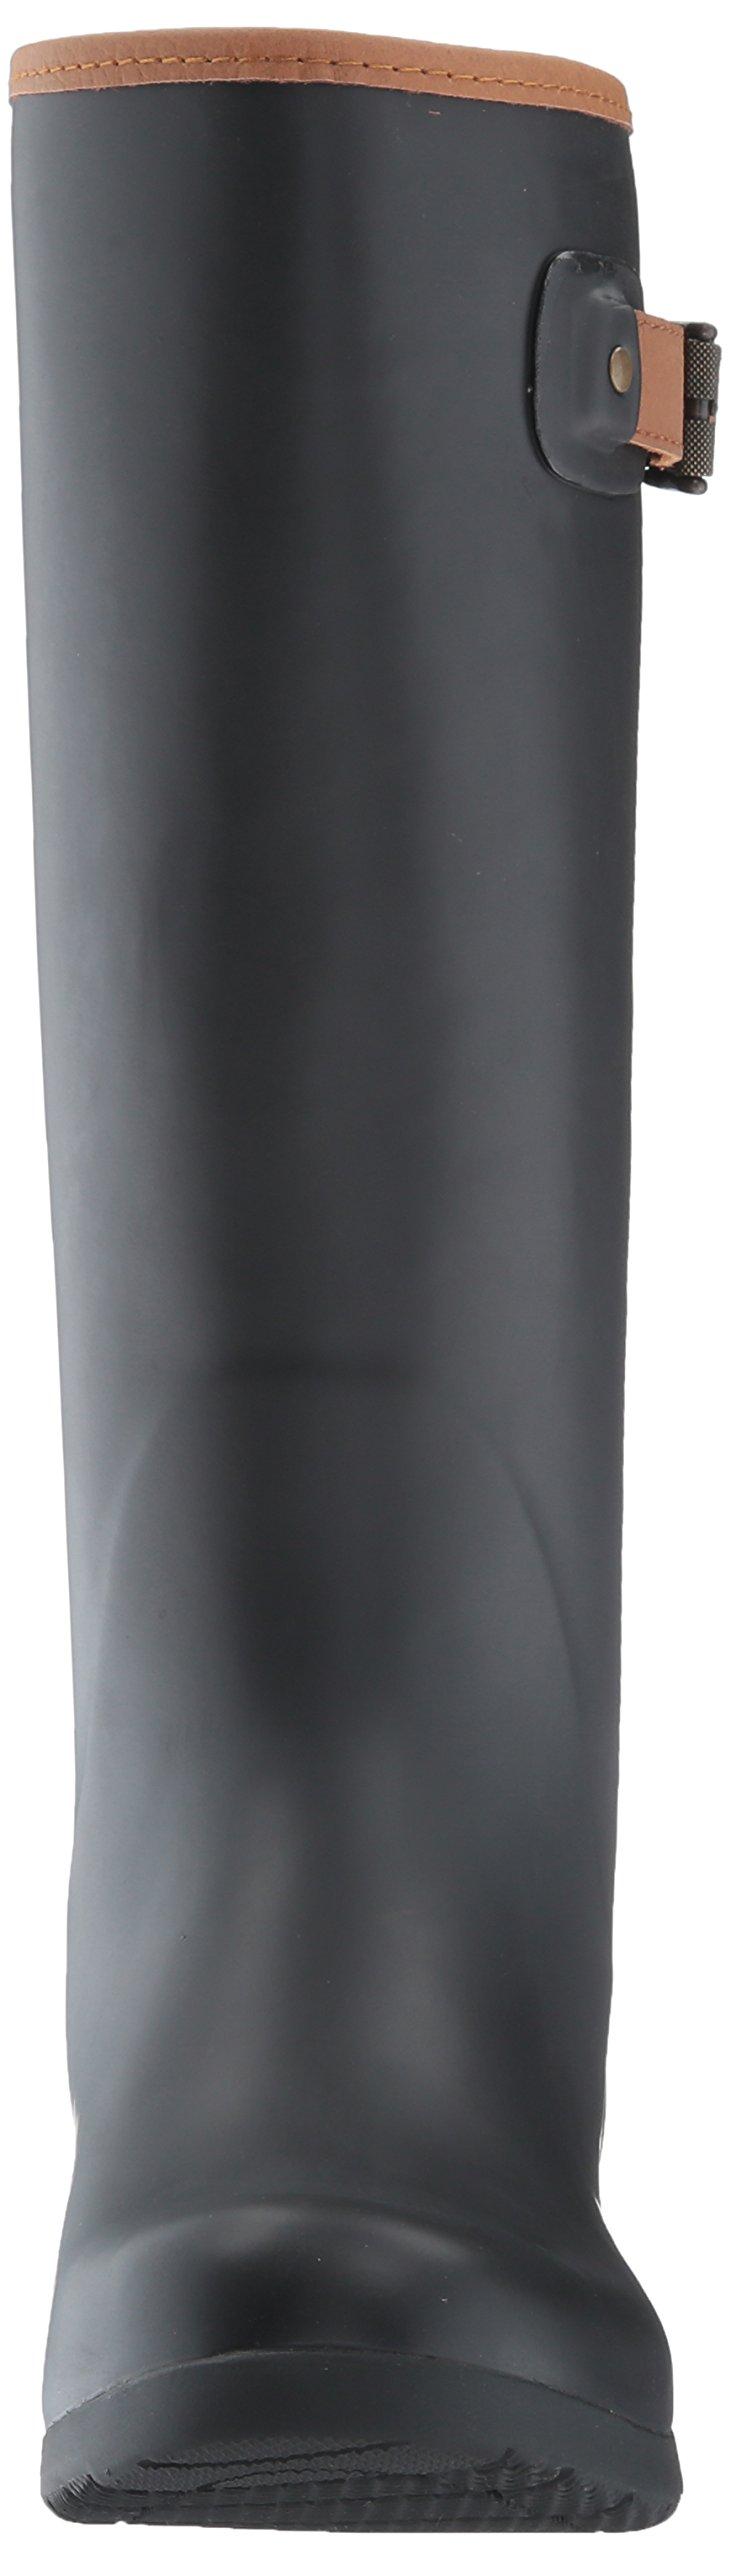 Chooka Women's Tall Memory Foam Rain Boot, Black, 7 M US by Chooka (Image #4)